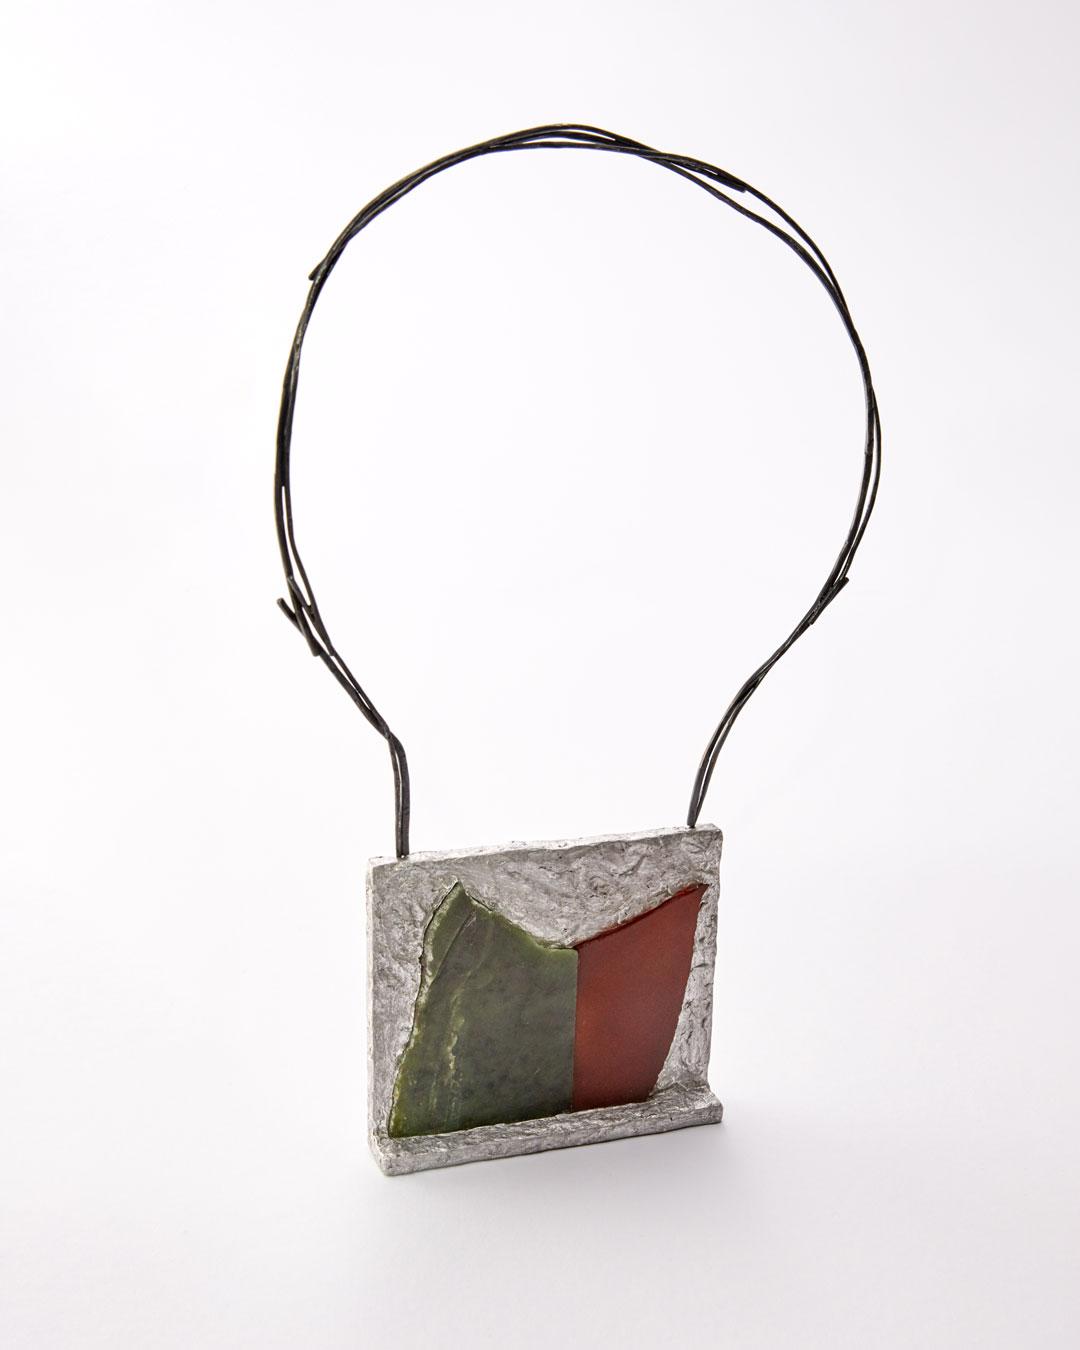 Iris Bodemer, Ordnung 3 (Array 3), 2019, pendant; aluminium, nephrite, carnelian, silver, mounting adhesive, 85 x 100 x 20 mm, €4000